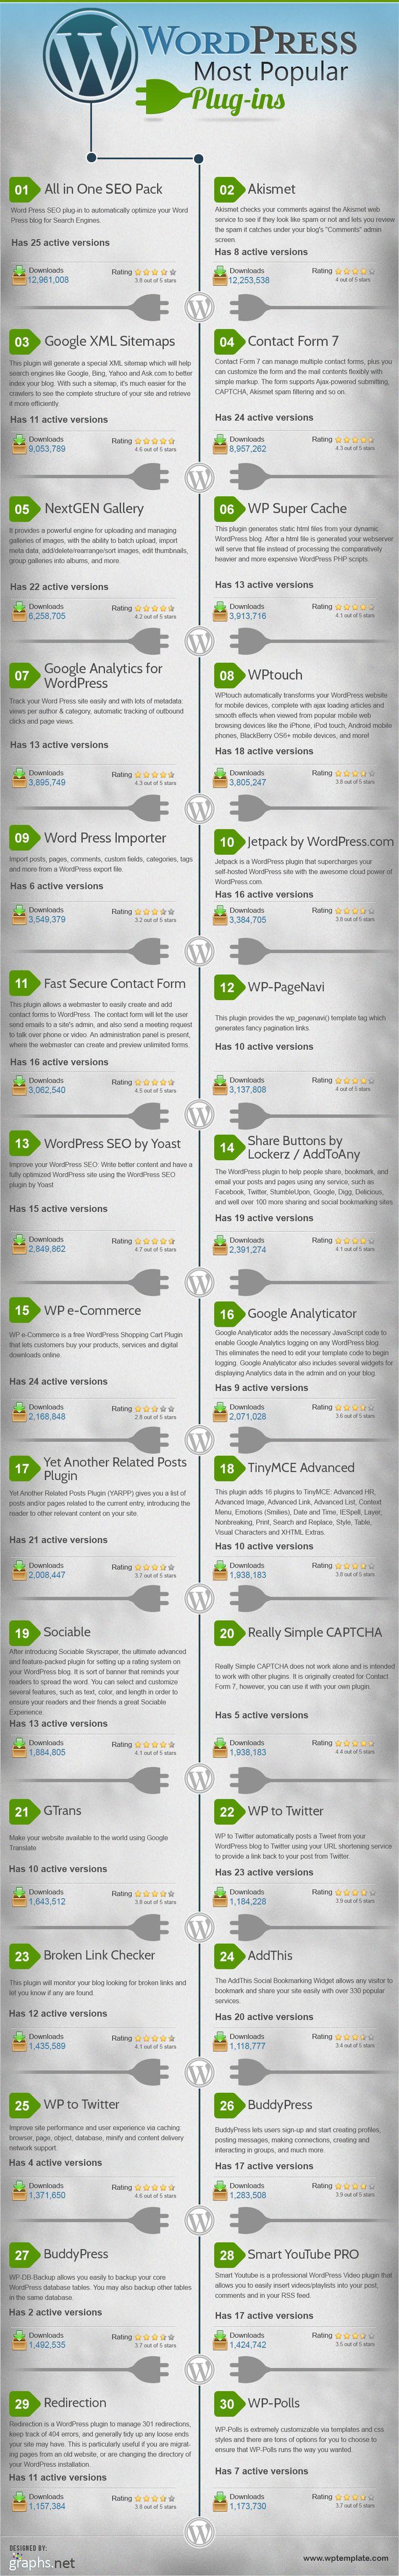 30 WordPress most poular plug-ins #infographic